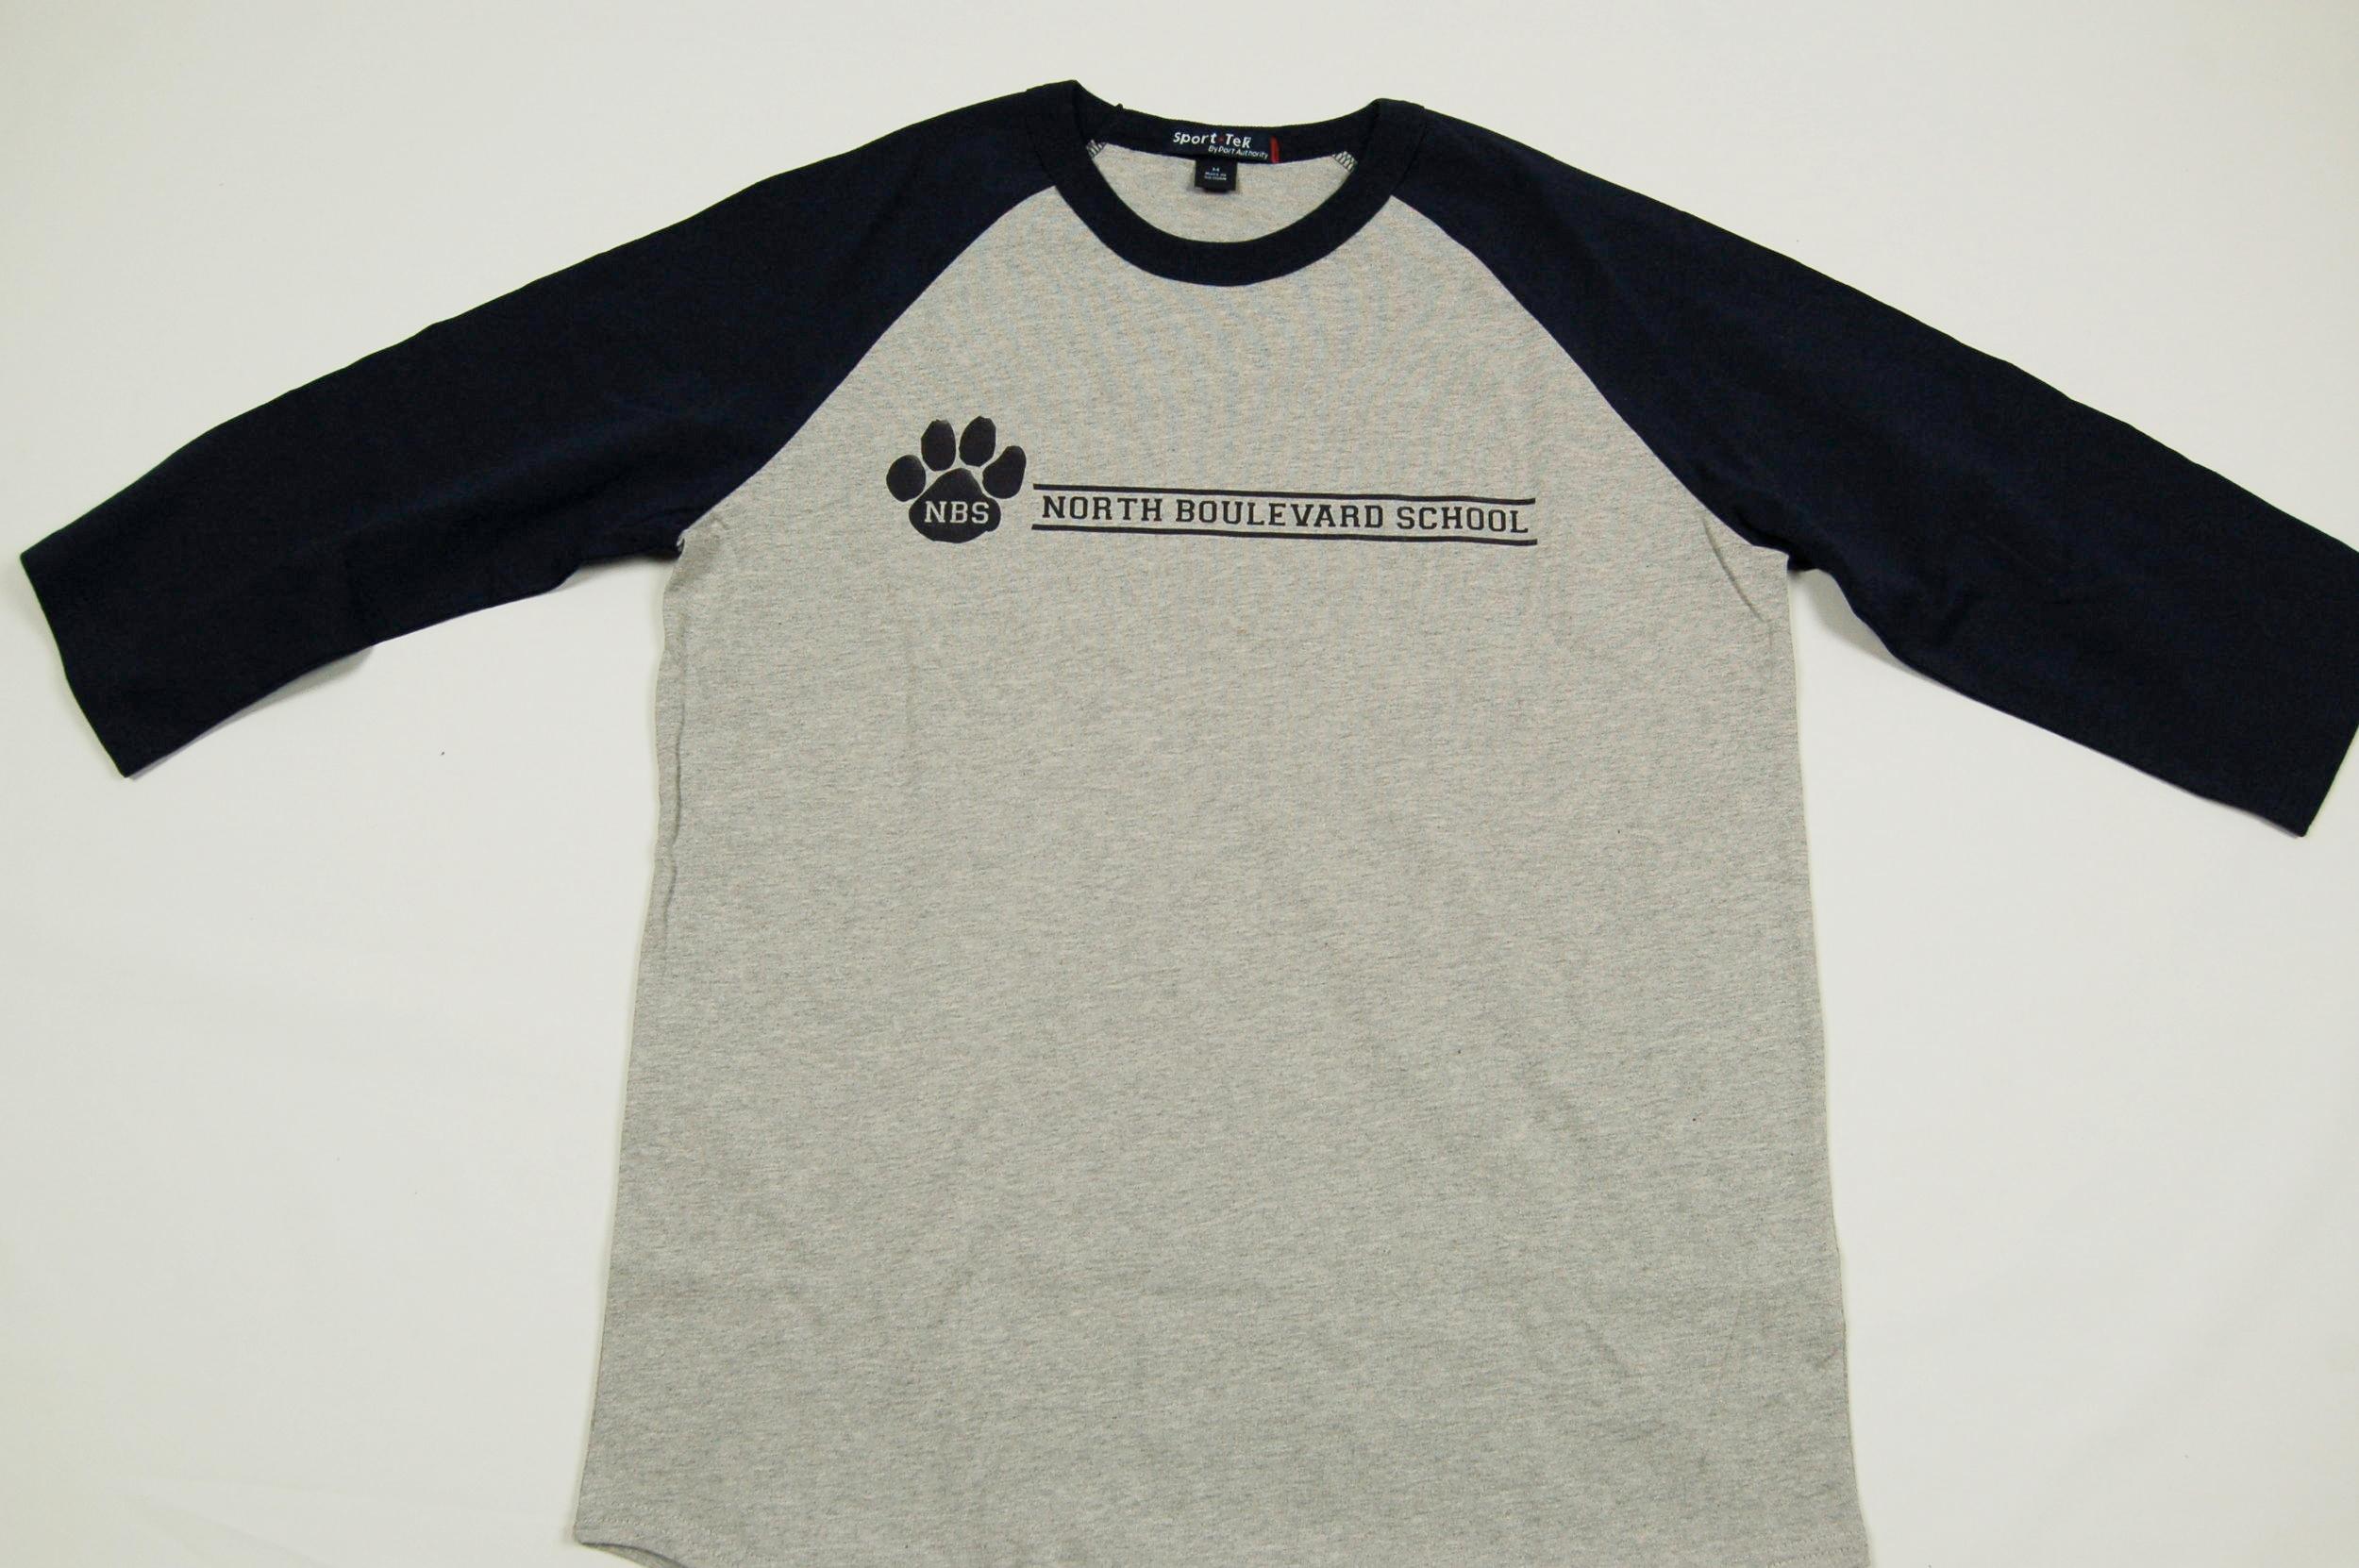 North Boulevard School 3/4 sleeve T-Shirt.